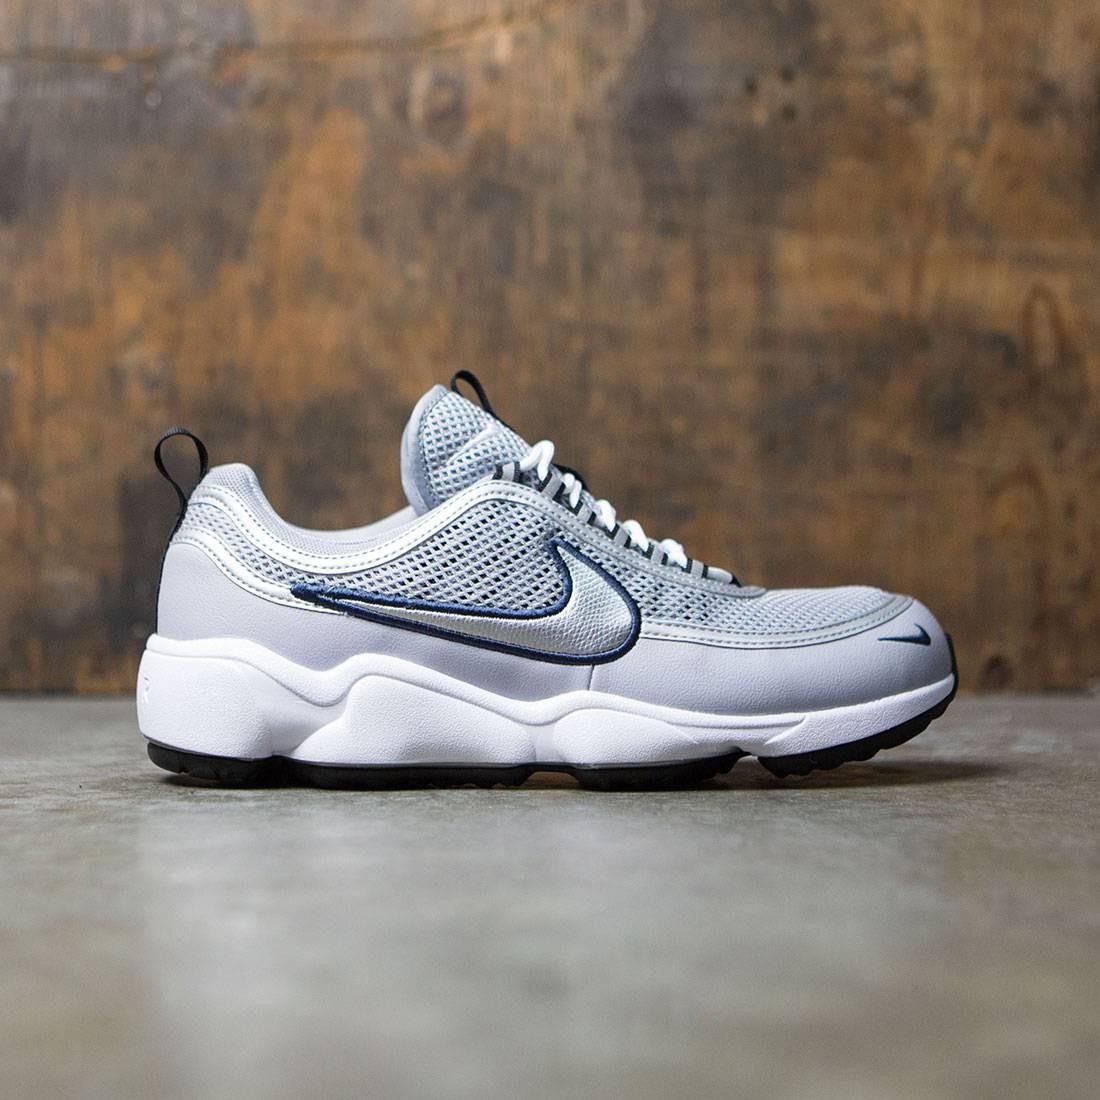 Nike Air Zoom Spiridon Metallic Silver